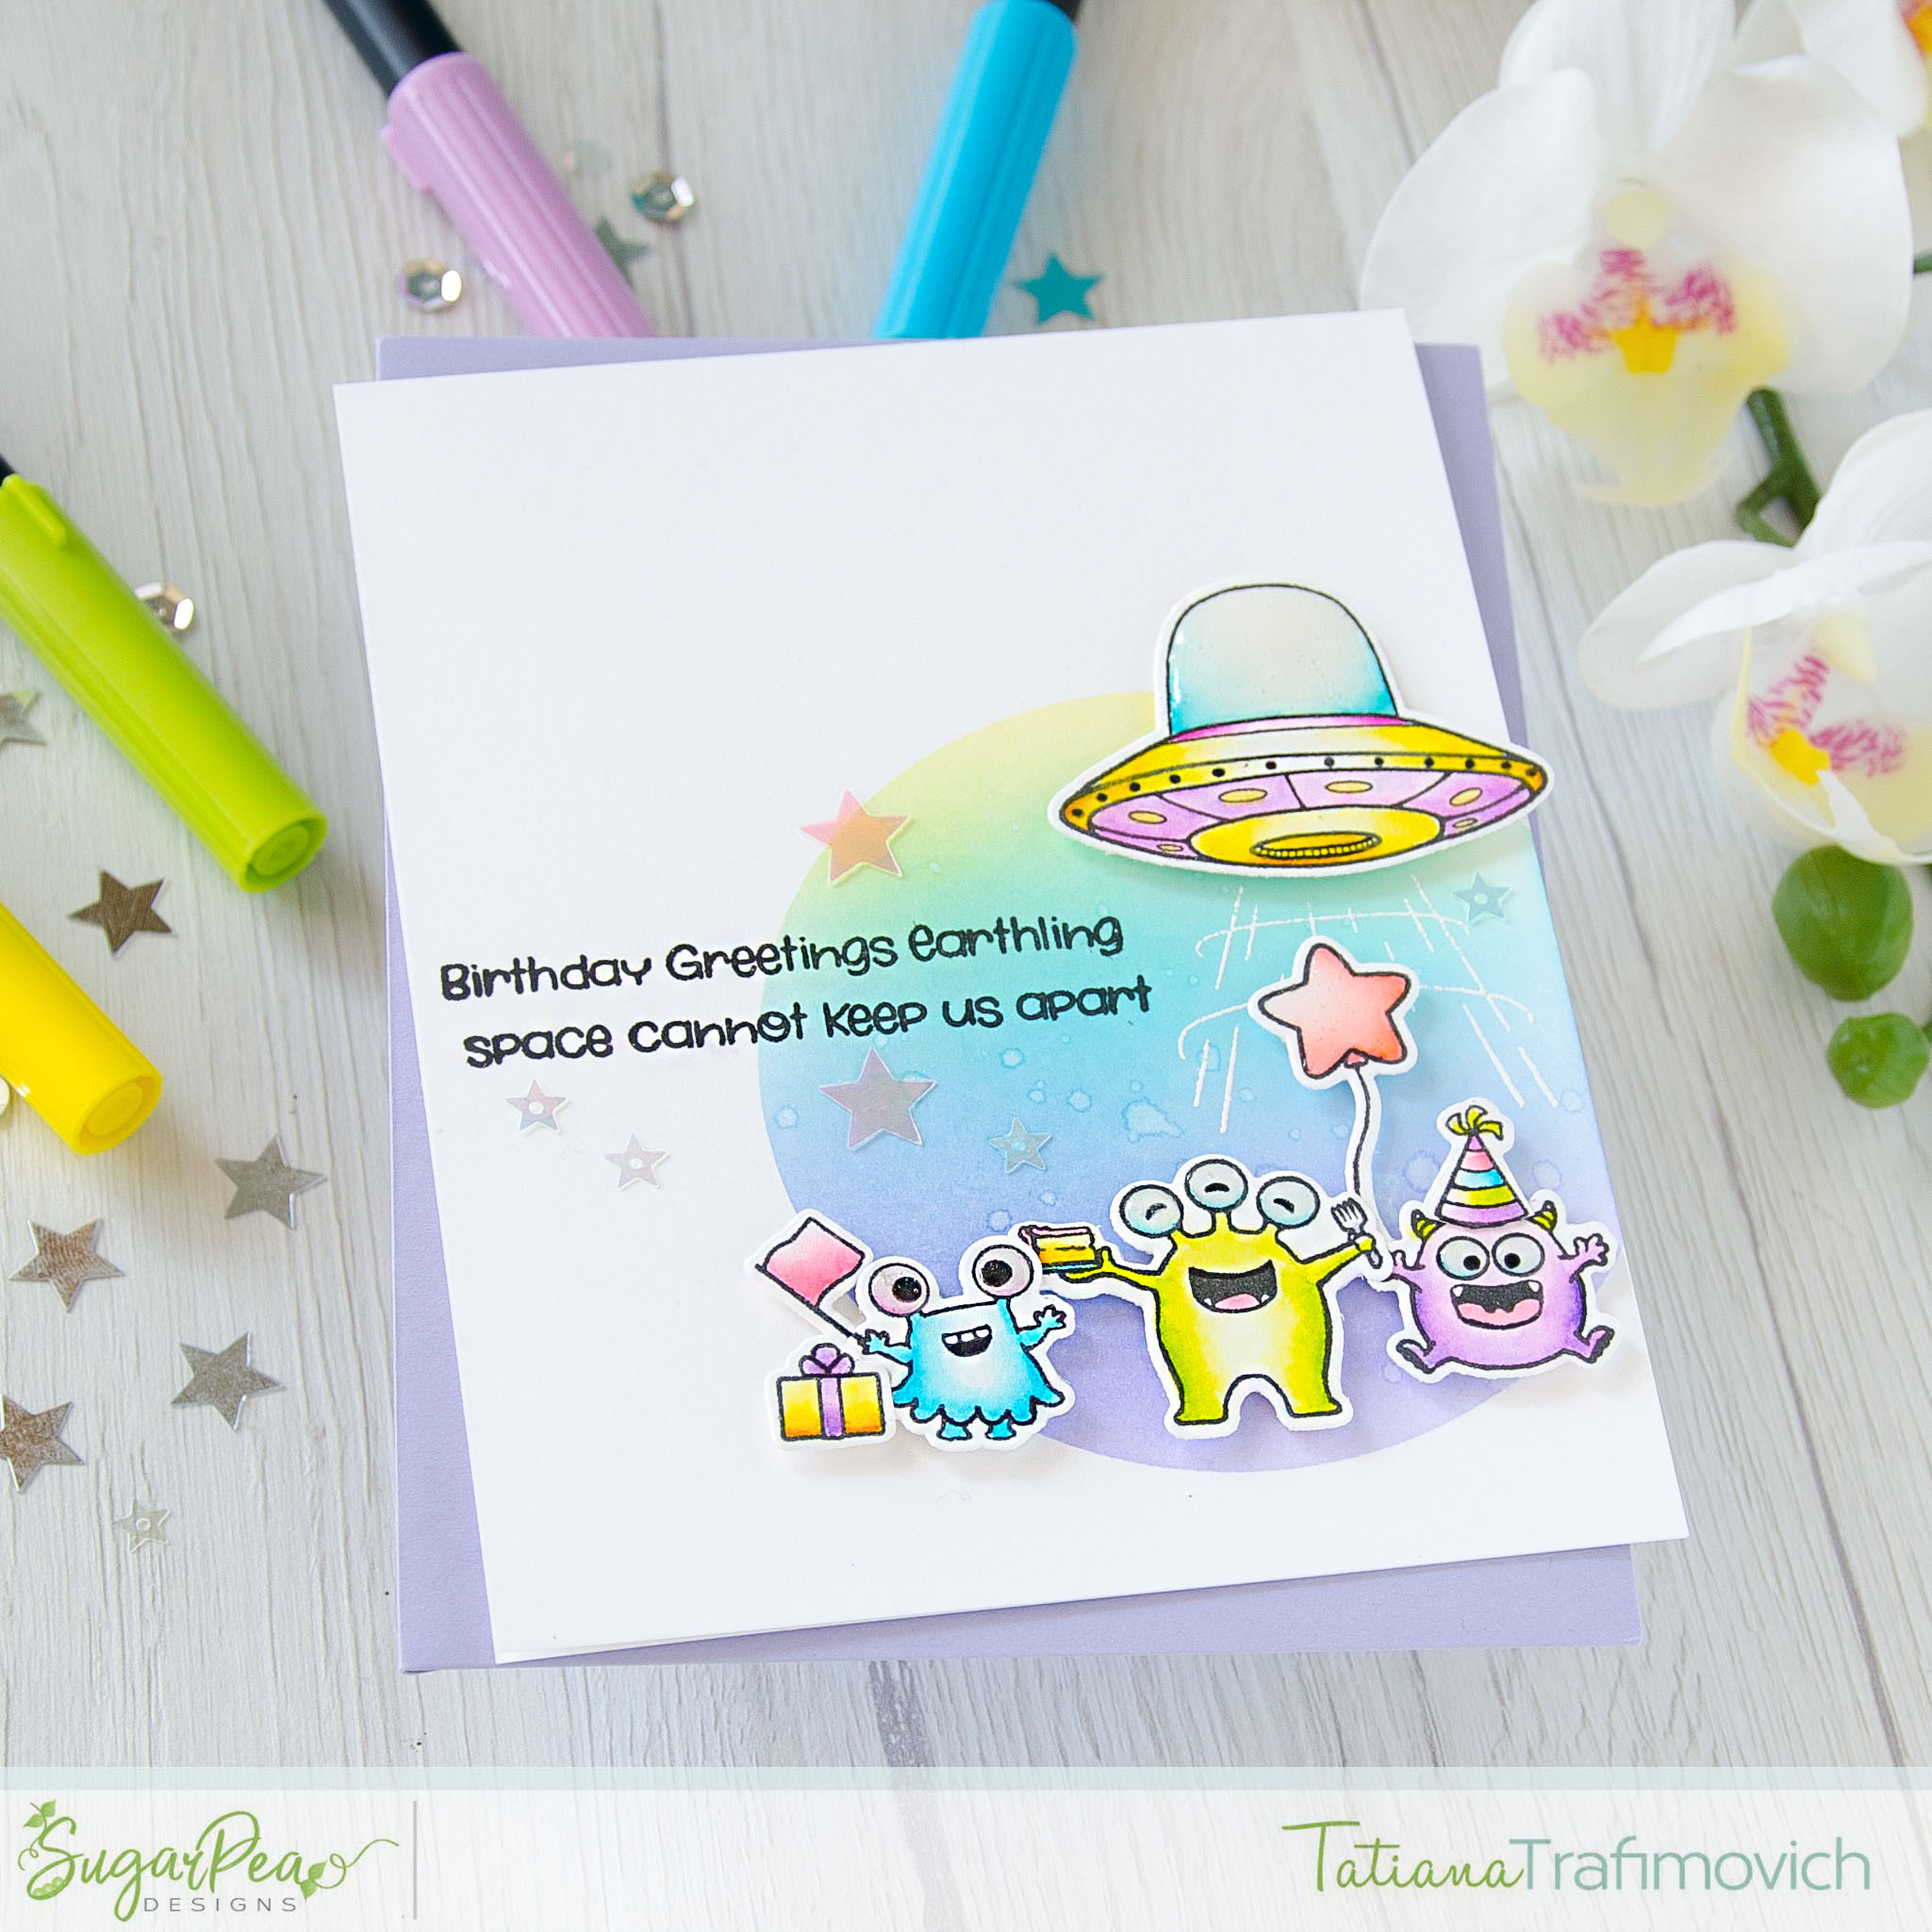 Birthday Greetings Earthling #handmade card by Tatiana Trafimovich #tatianacraftandart - Take Us To Your Cake stamp set by SugarPea Designs #sugarpeadesigns